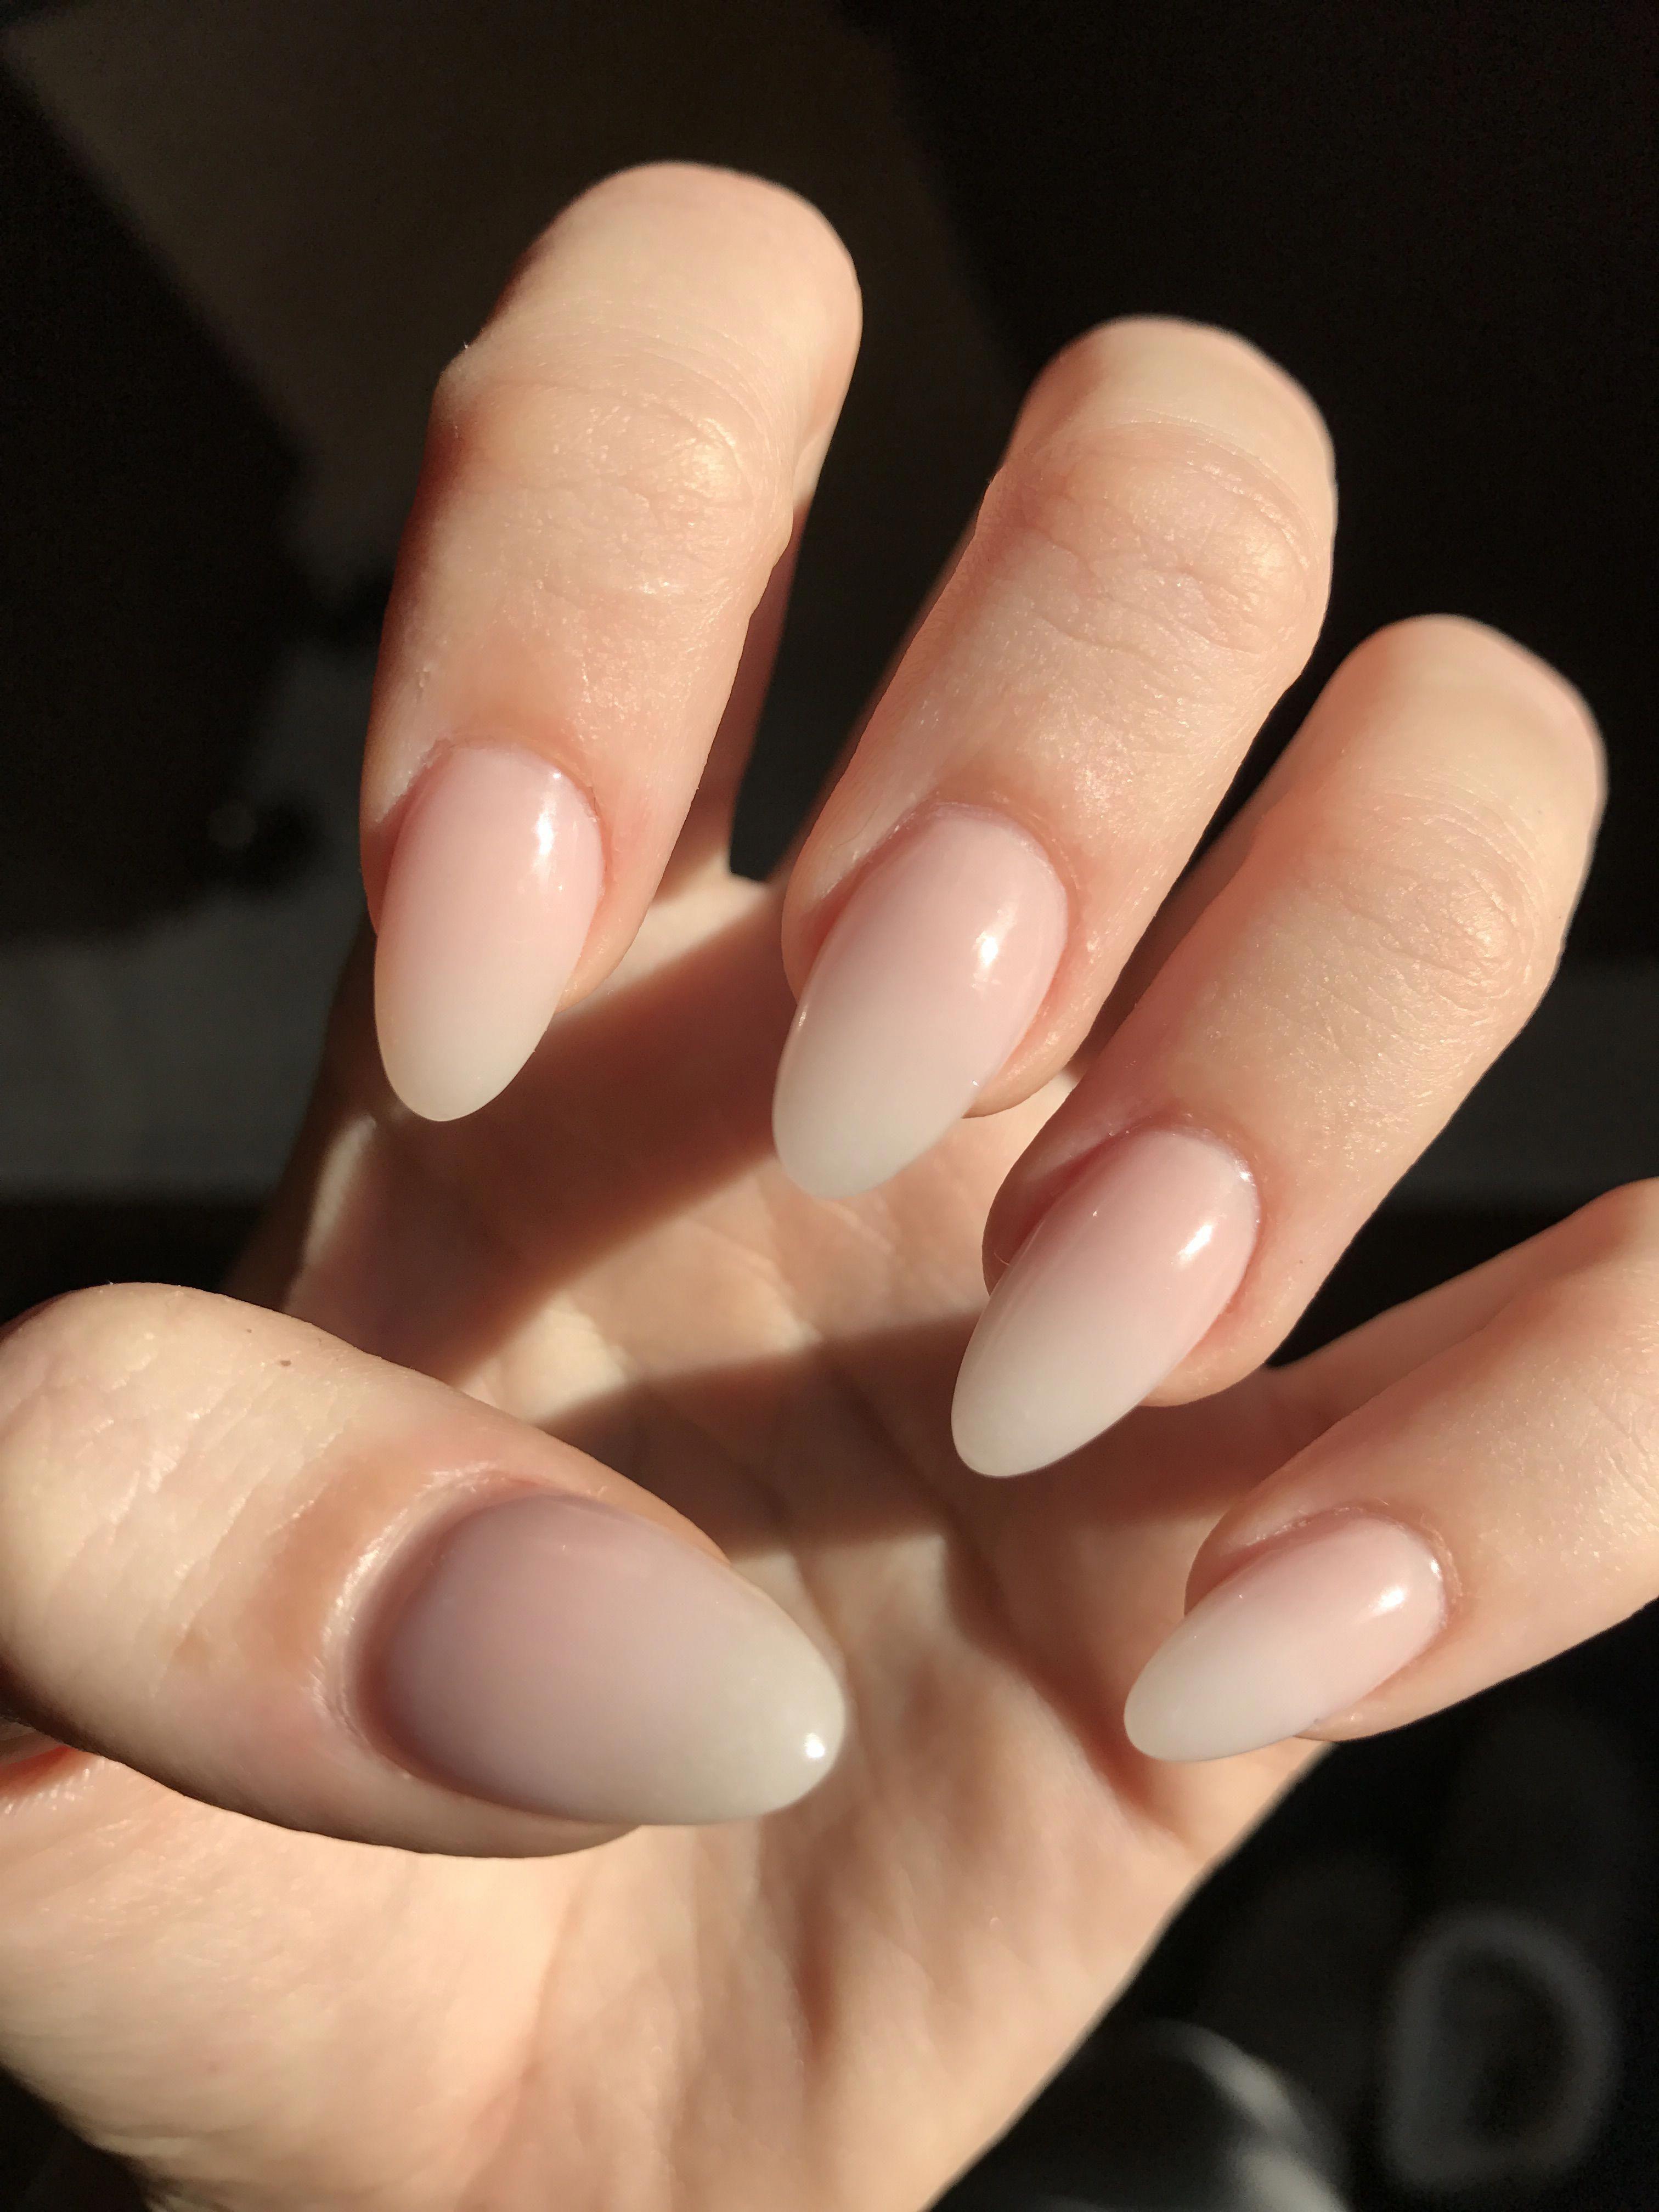 Natural Ombré Almond Acrylic Nails #AcrylicNailsStiletto ...